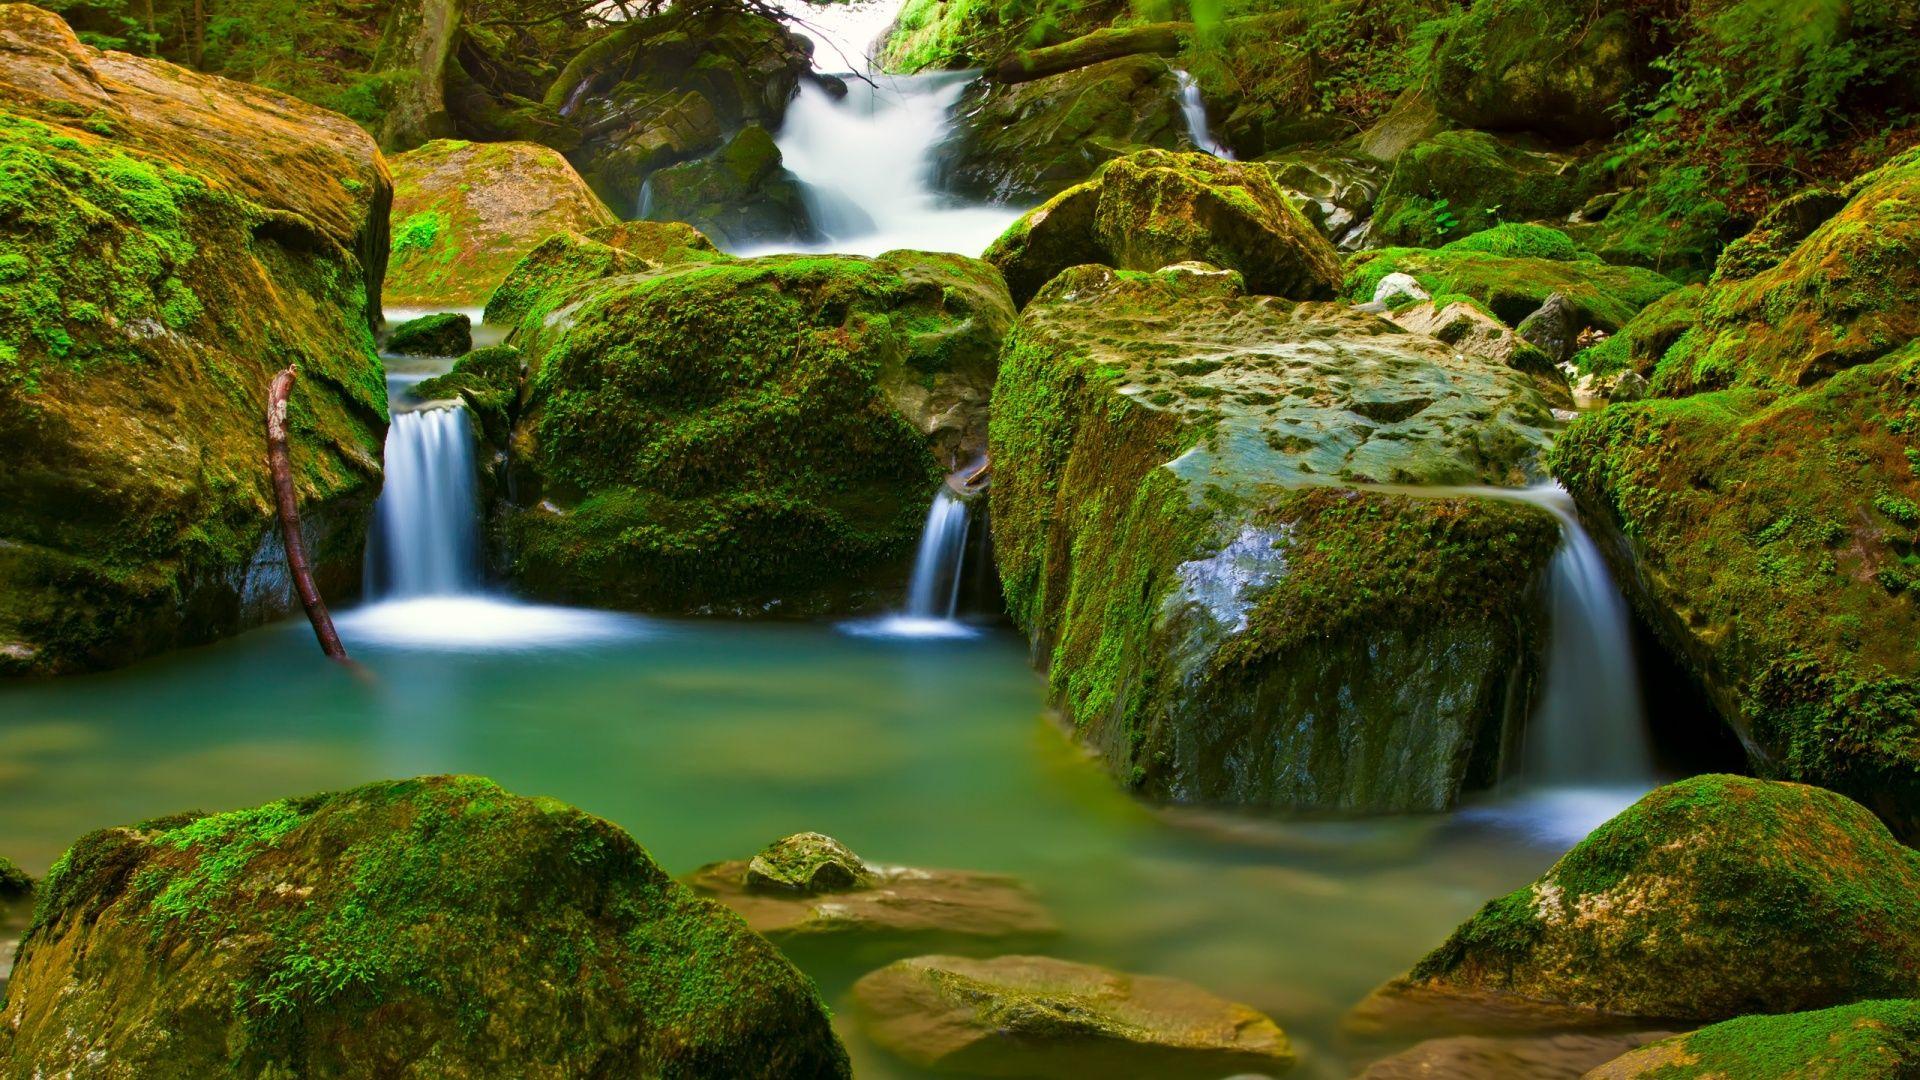 3D Waterfall Wallpapers HD 07 1920x1080 JPEG Image 1920 X 1080